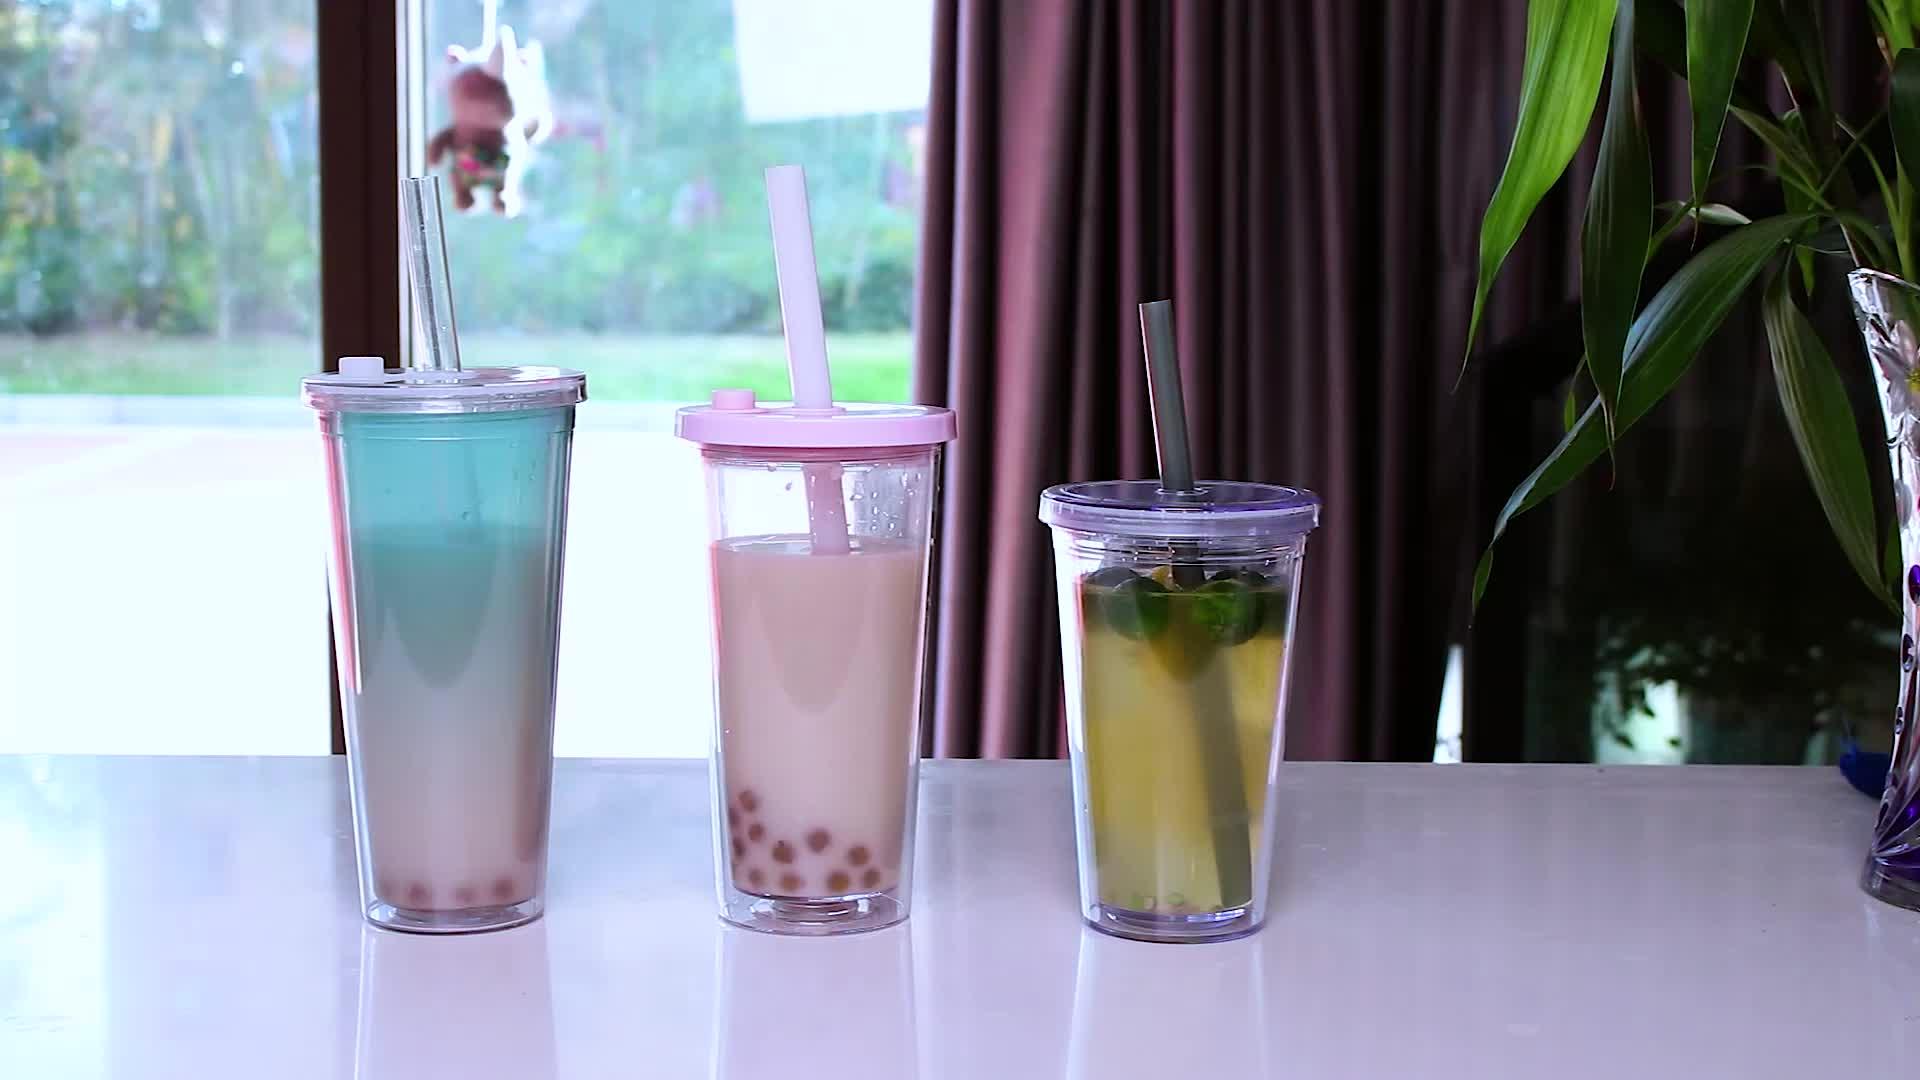 Custom 16/24/20 Oz Clear Acryl Melk Thee Plastic Tumbler Cups Herbruikbare Dubbele Muur Bubble Thee Tumbler cups